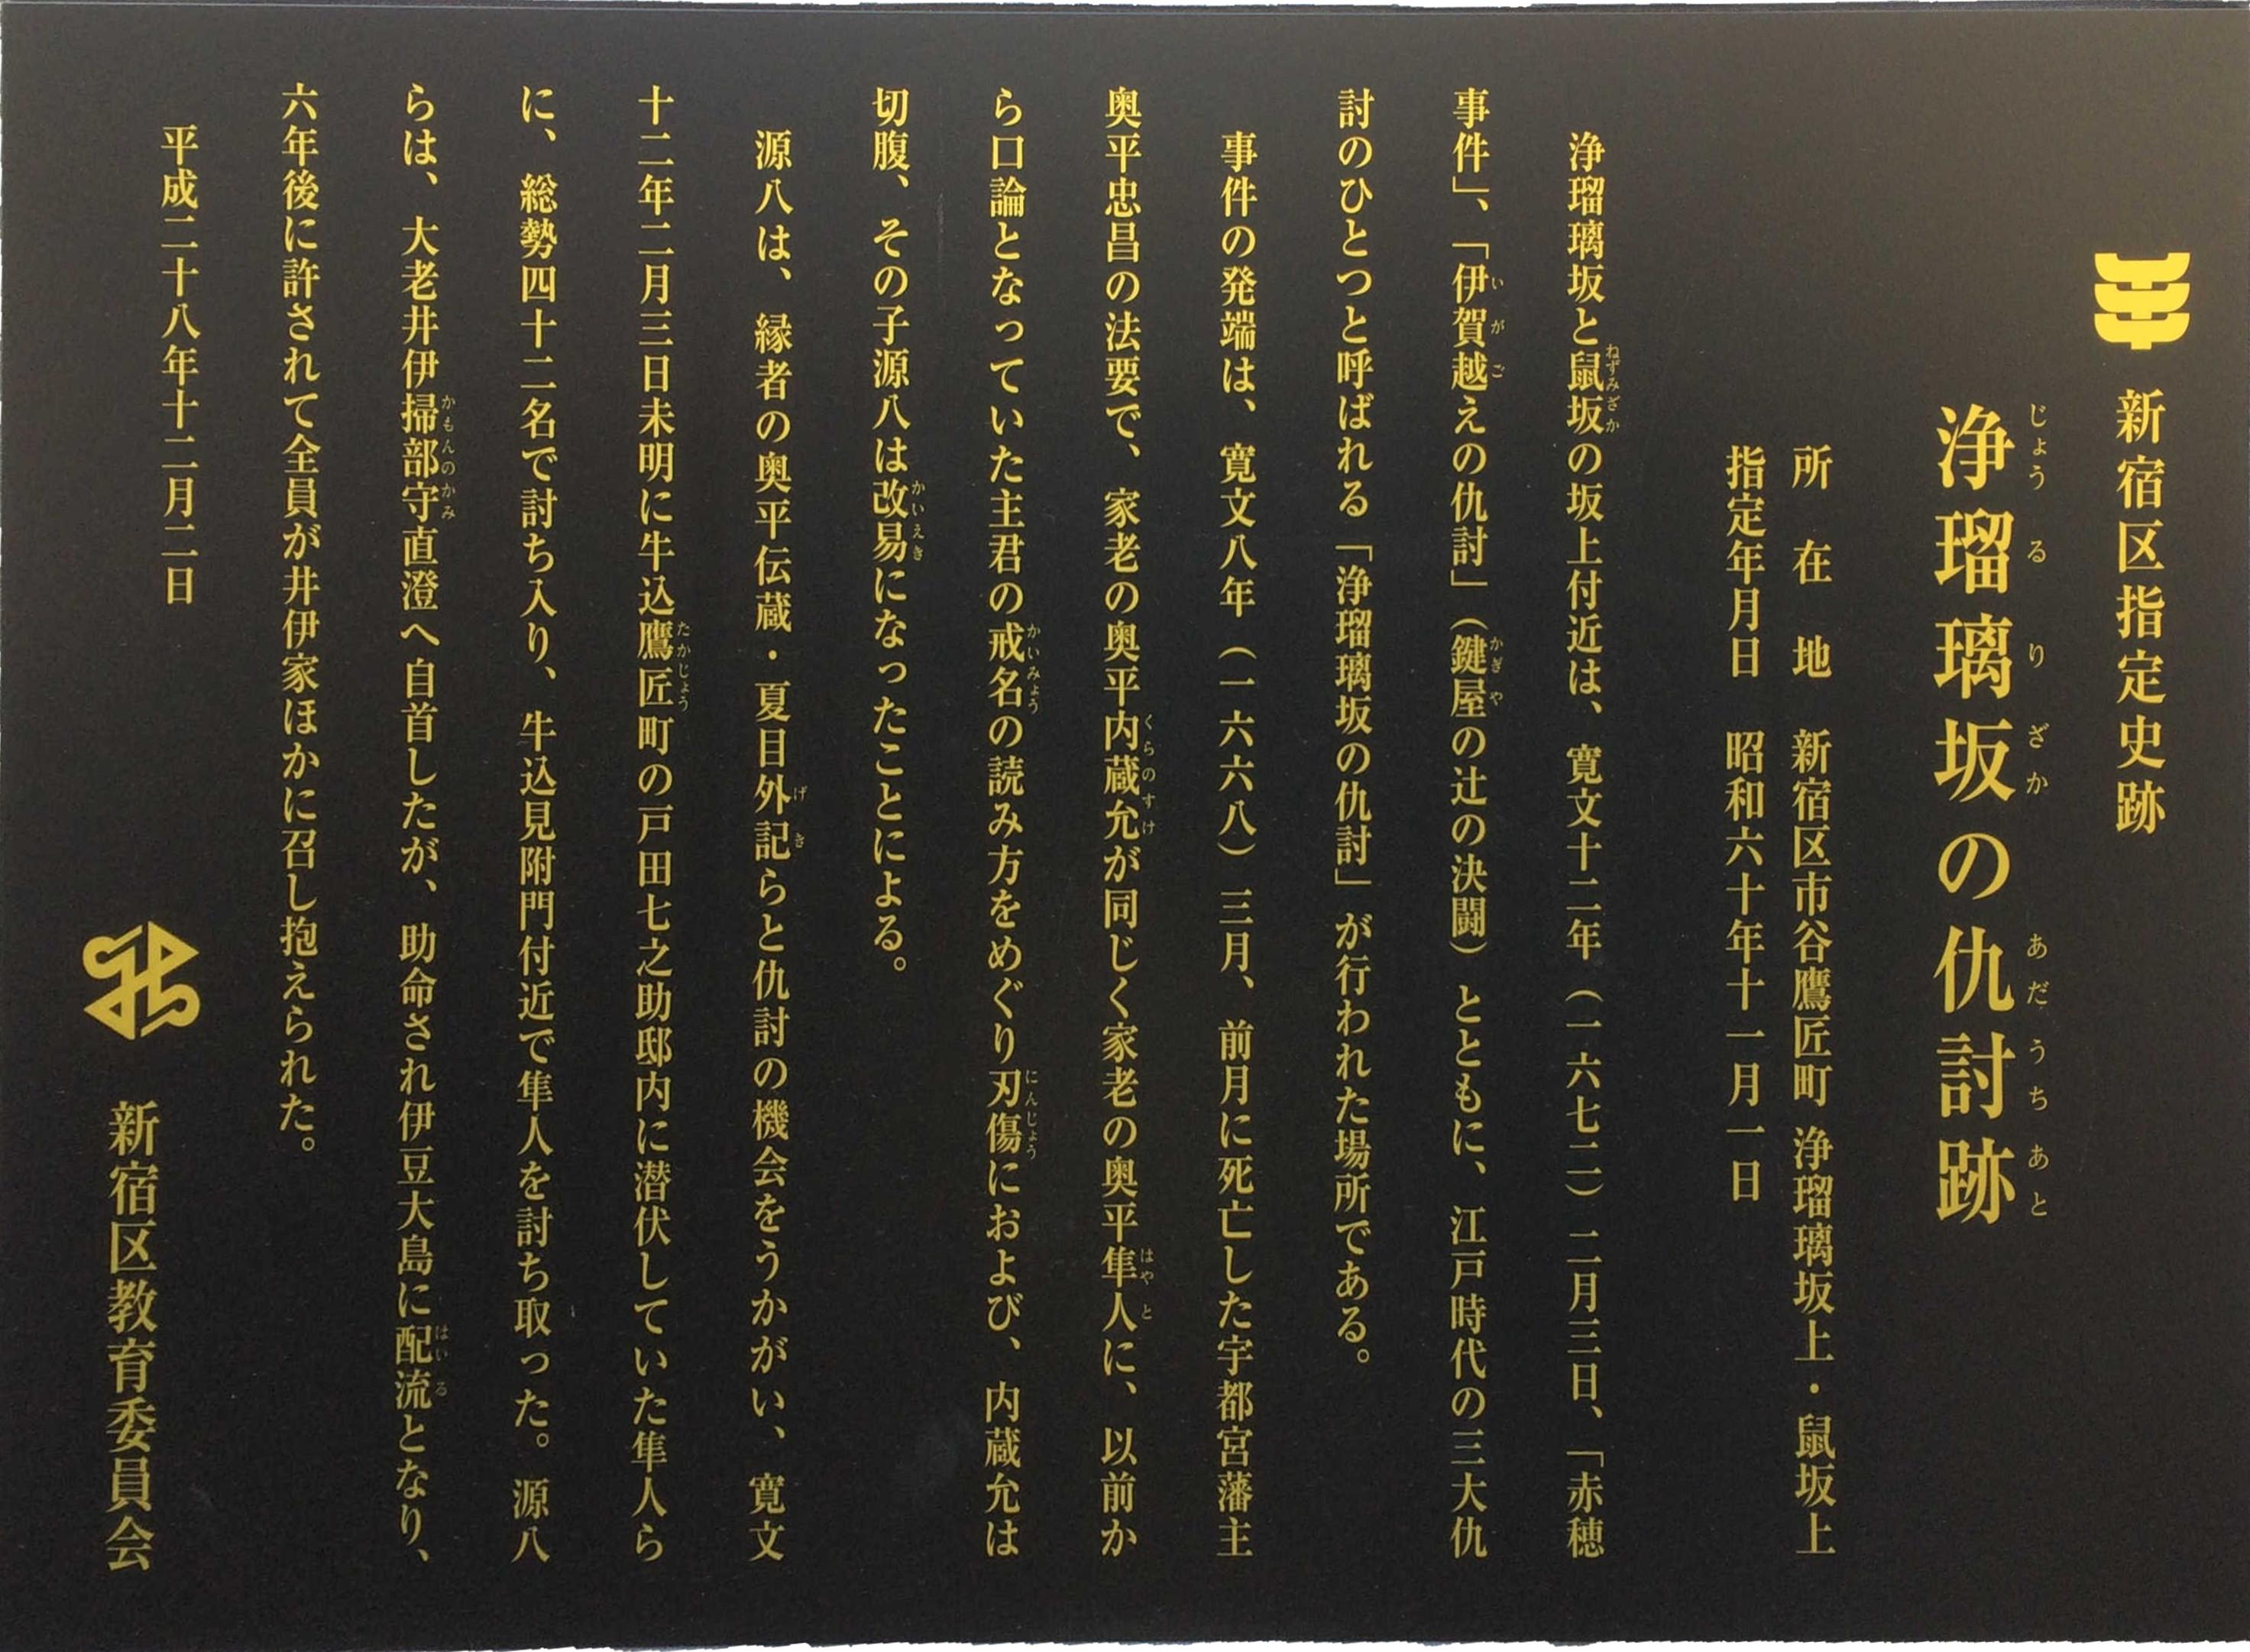 浄瑠璃坂の仇討跡画像